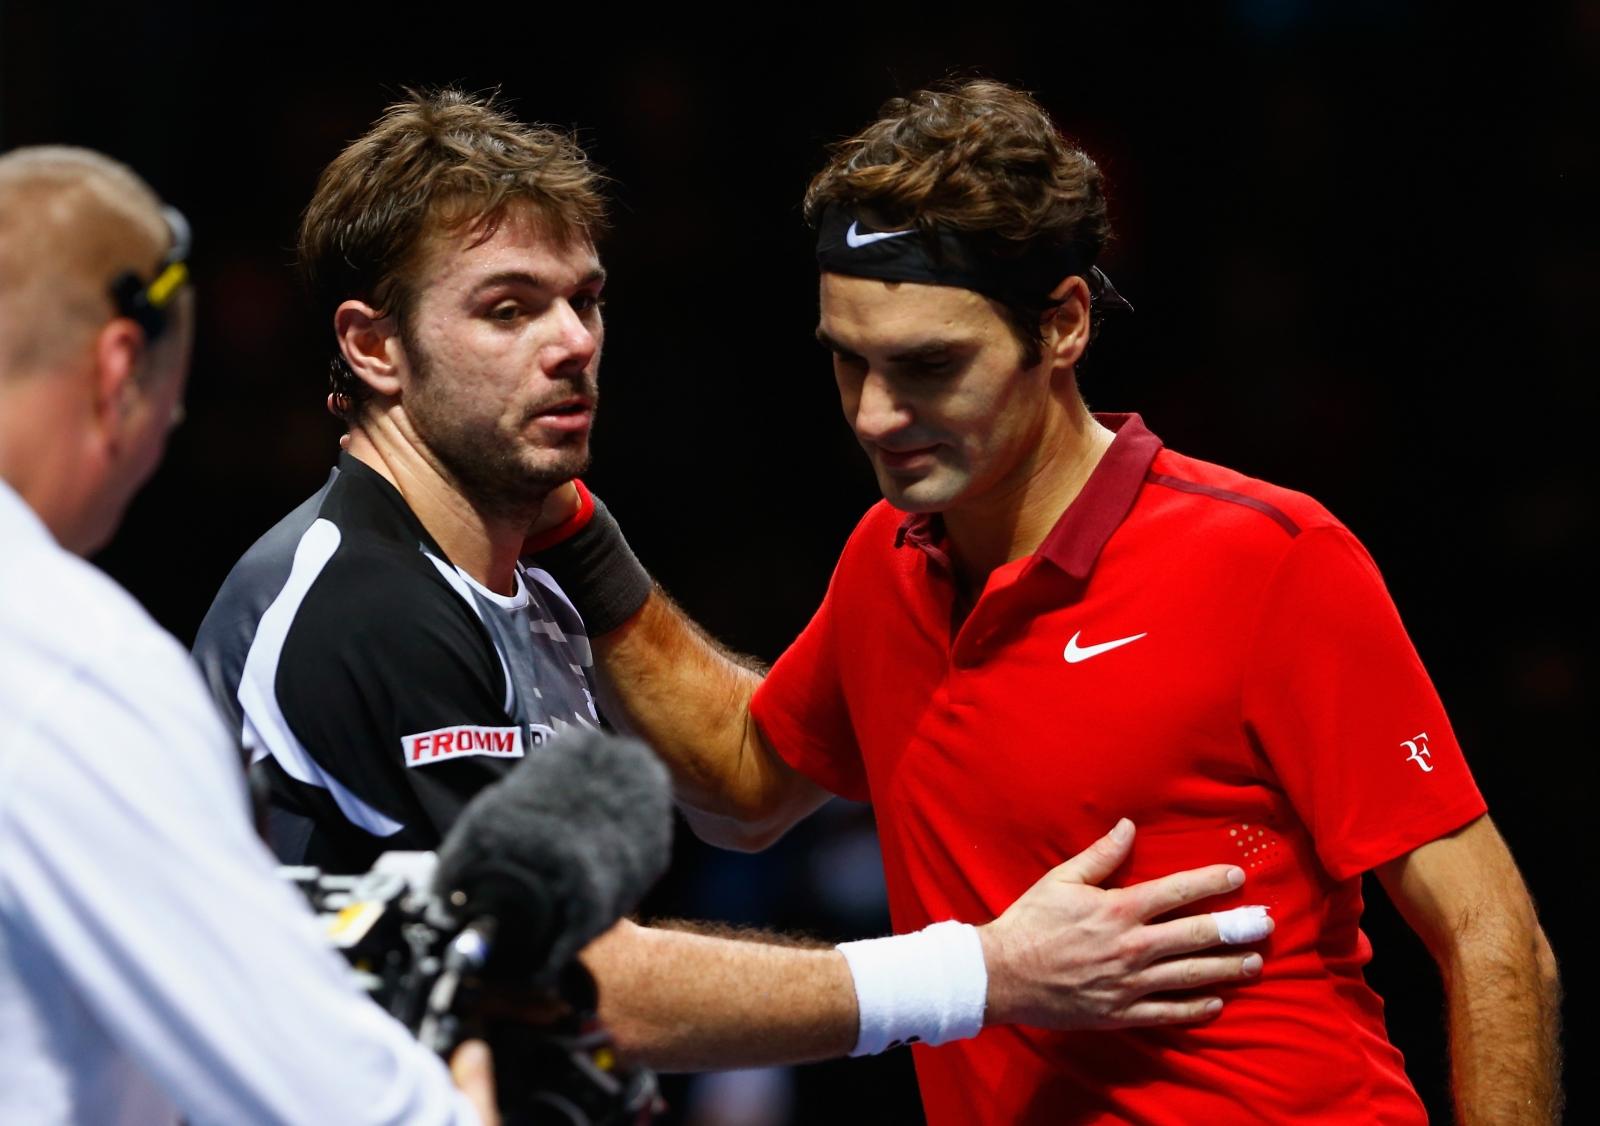 Roger Federer and Stanislas Wawrinka